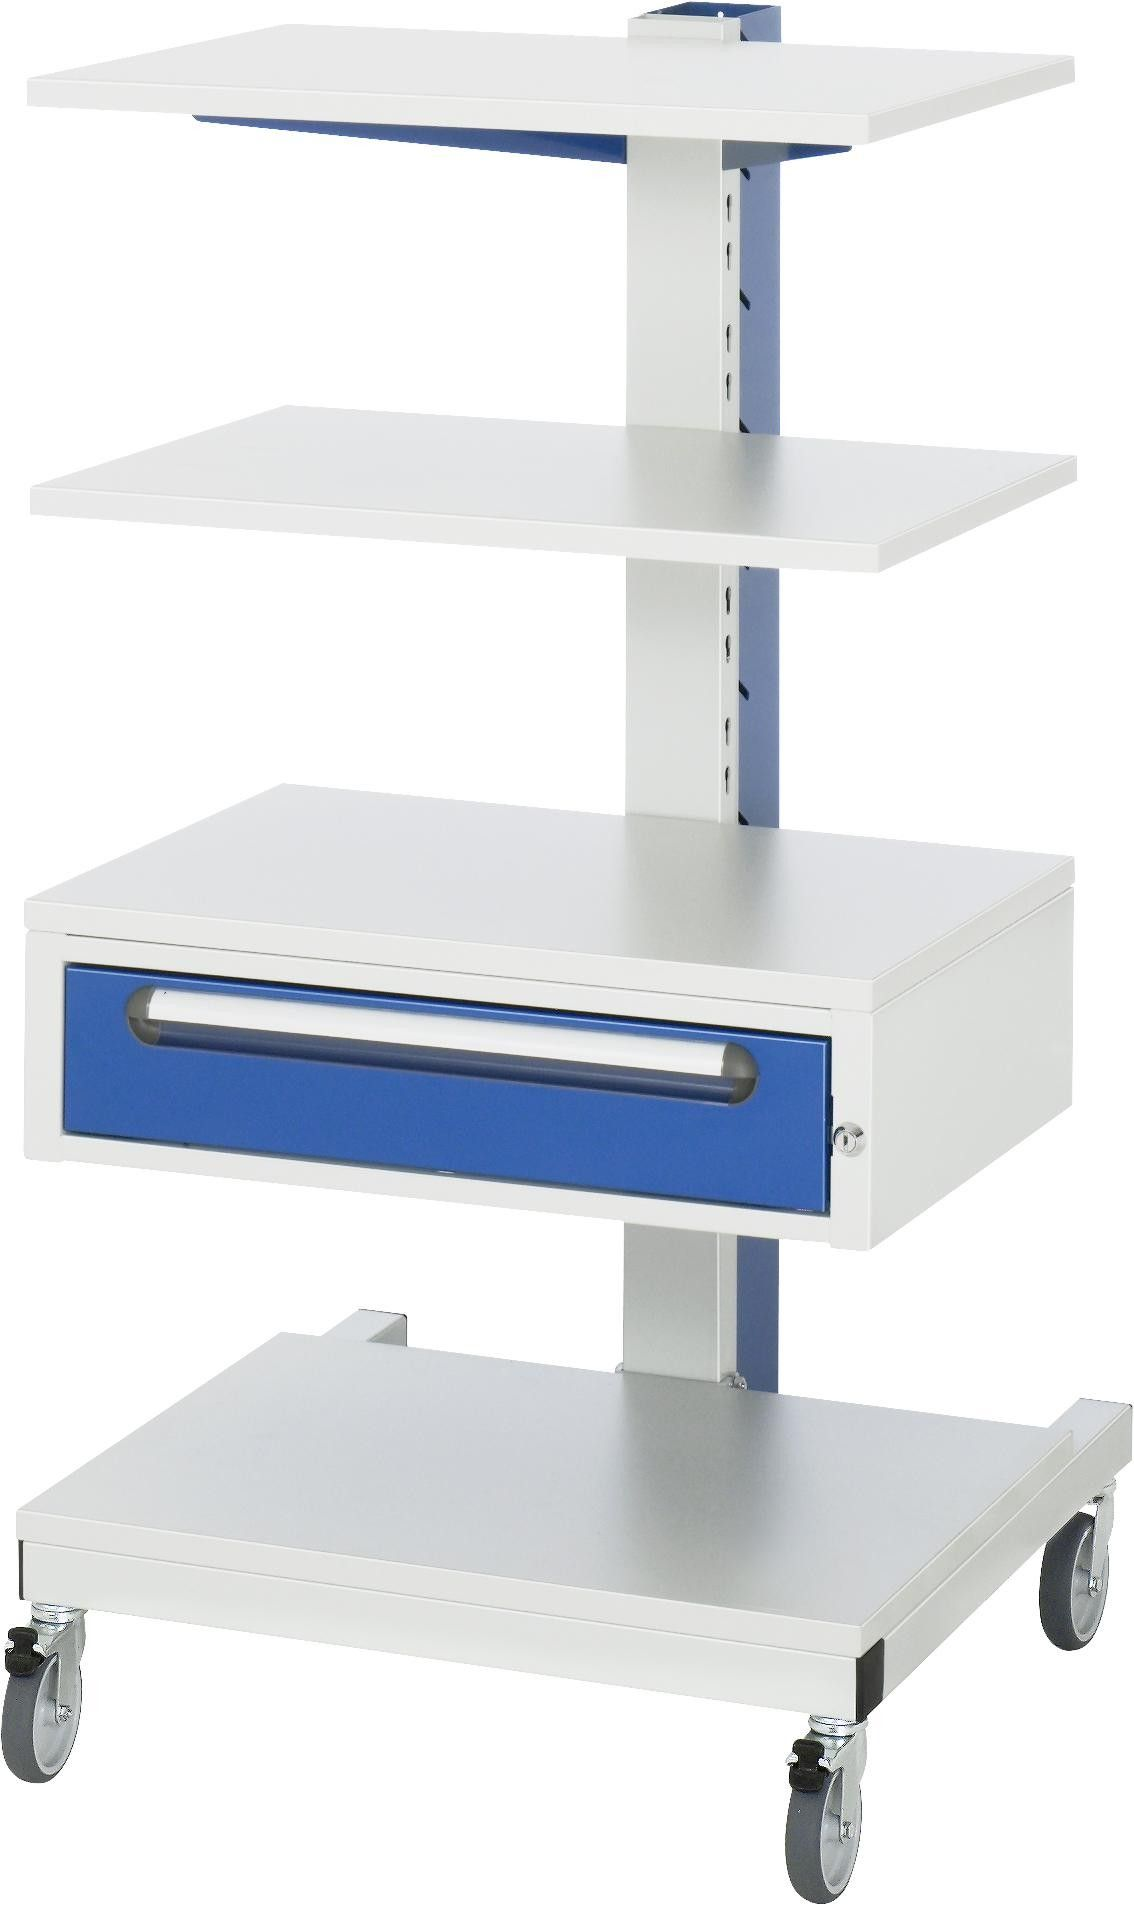 Computer Stander Modell 6002 650x650x1230mm Fahrbar Gtardo De In 2020 Computer Modell Konsole